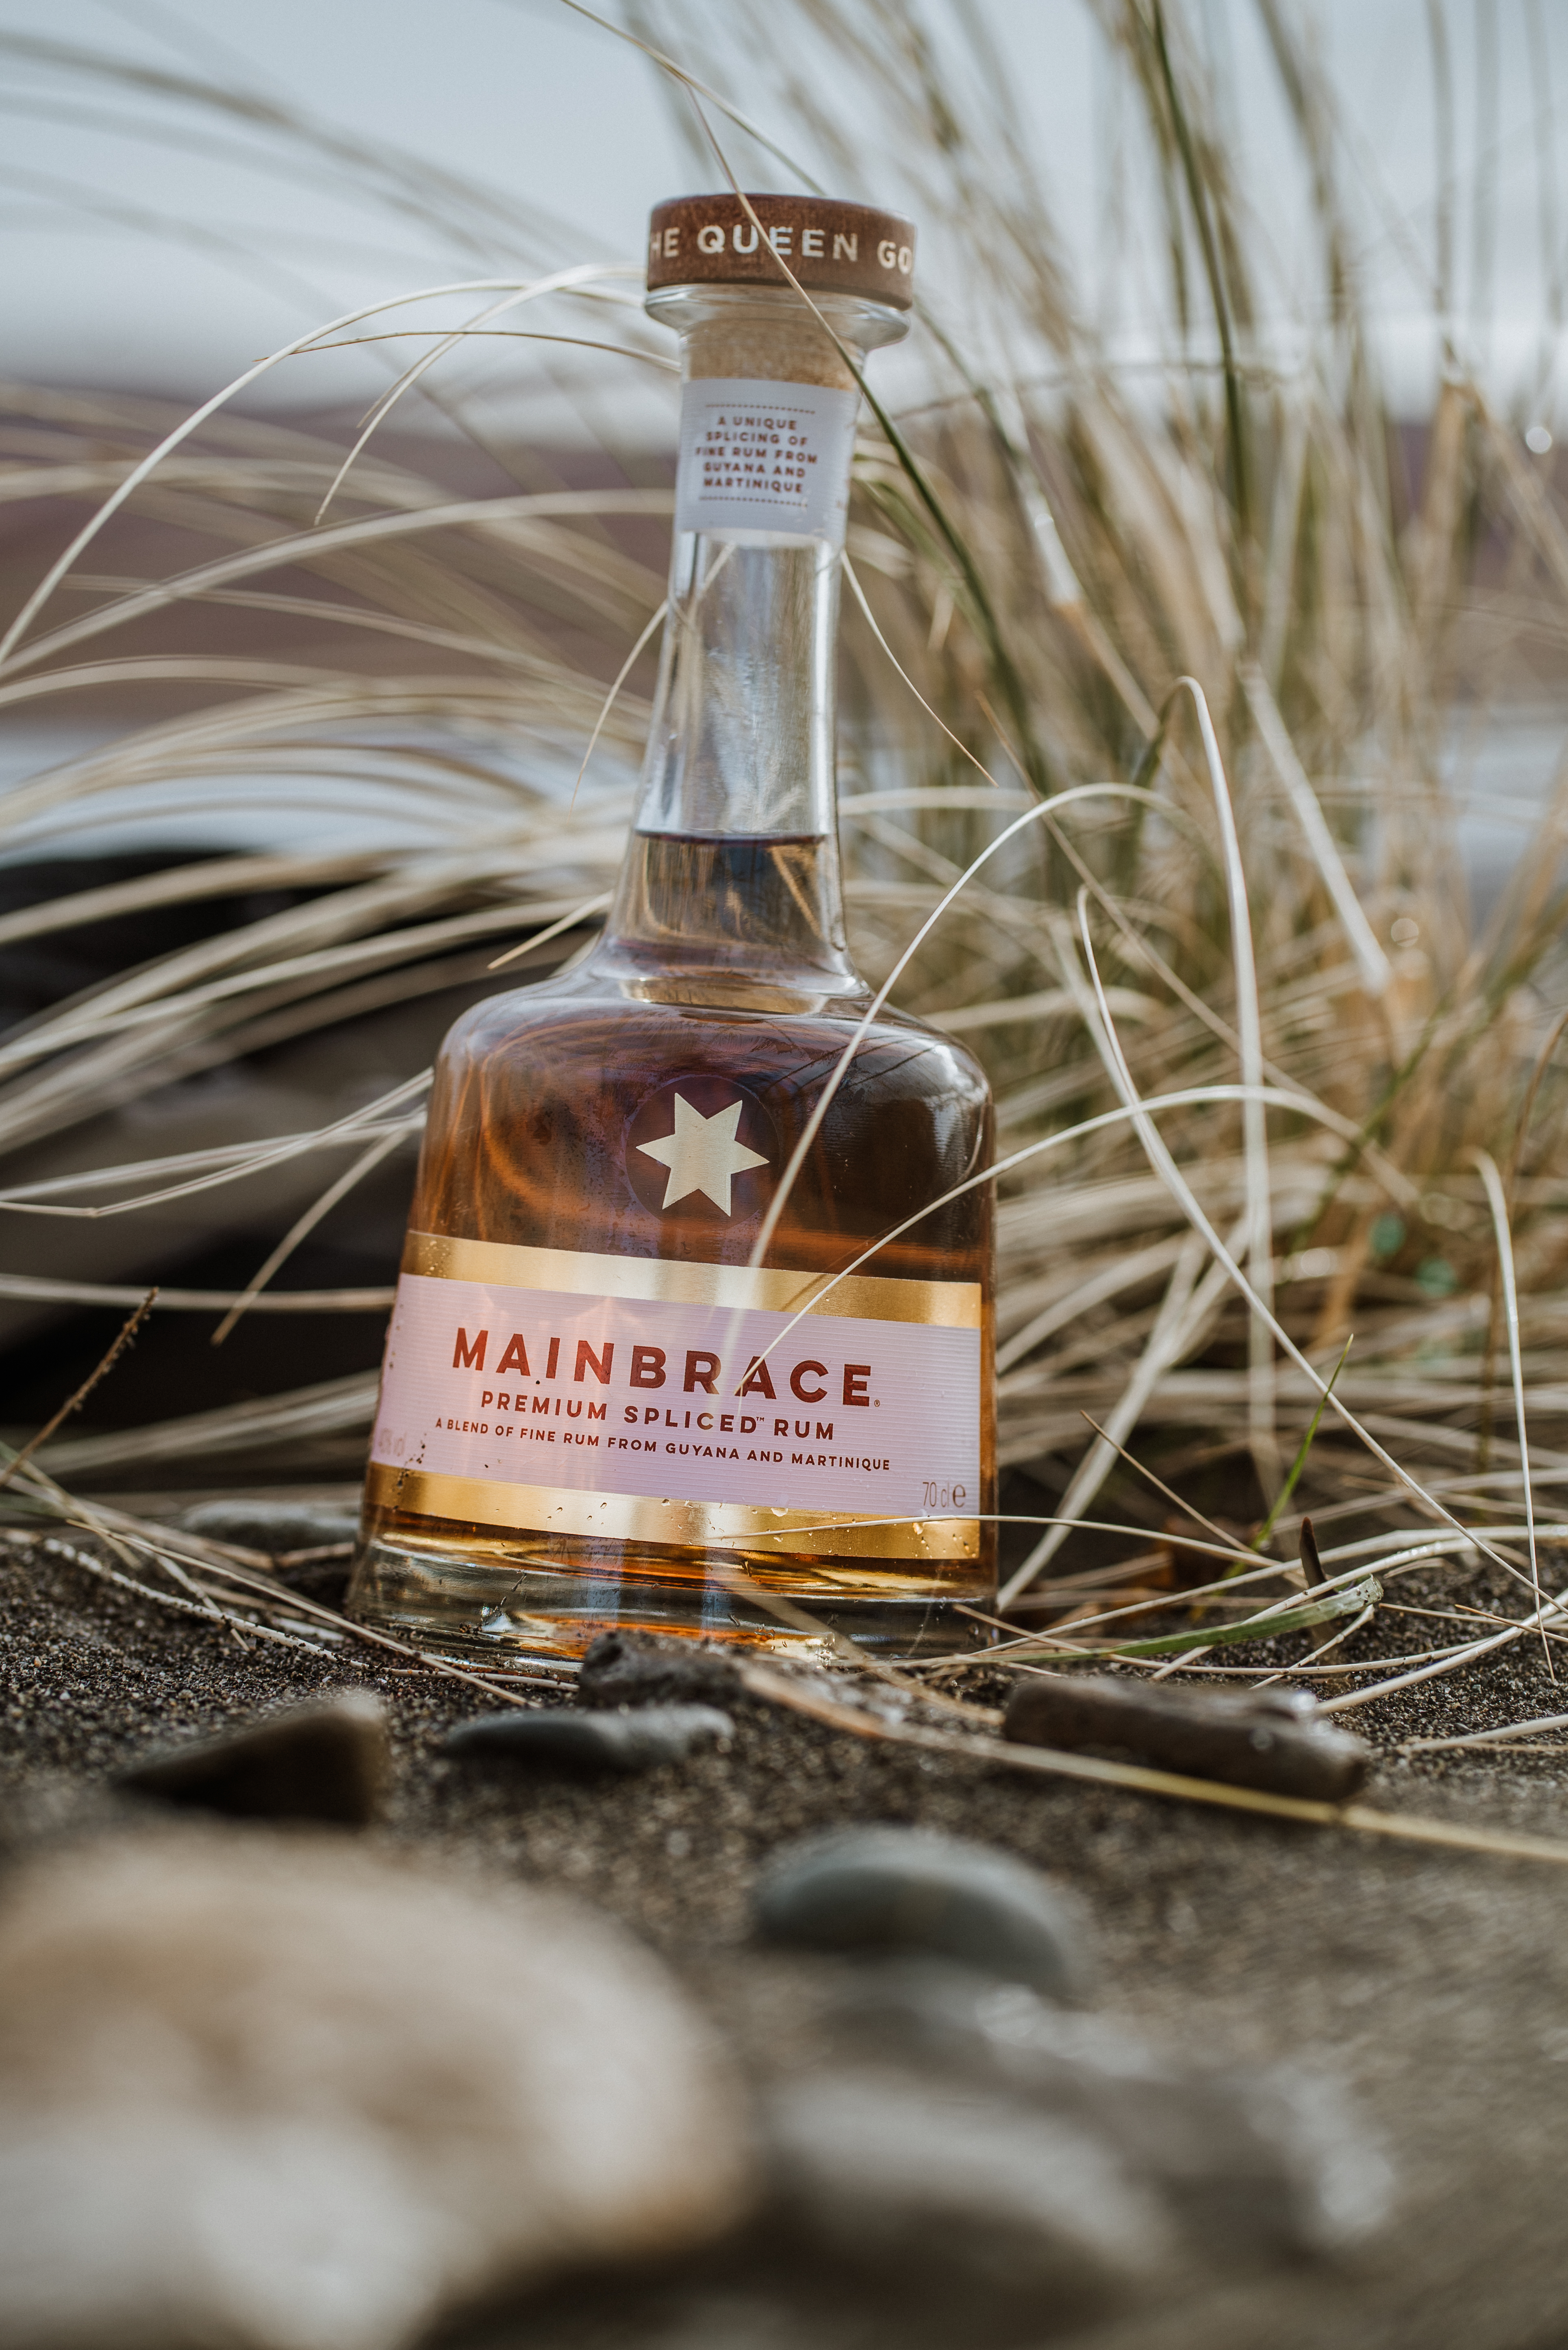 Product x Mainbrace Rum